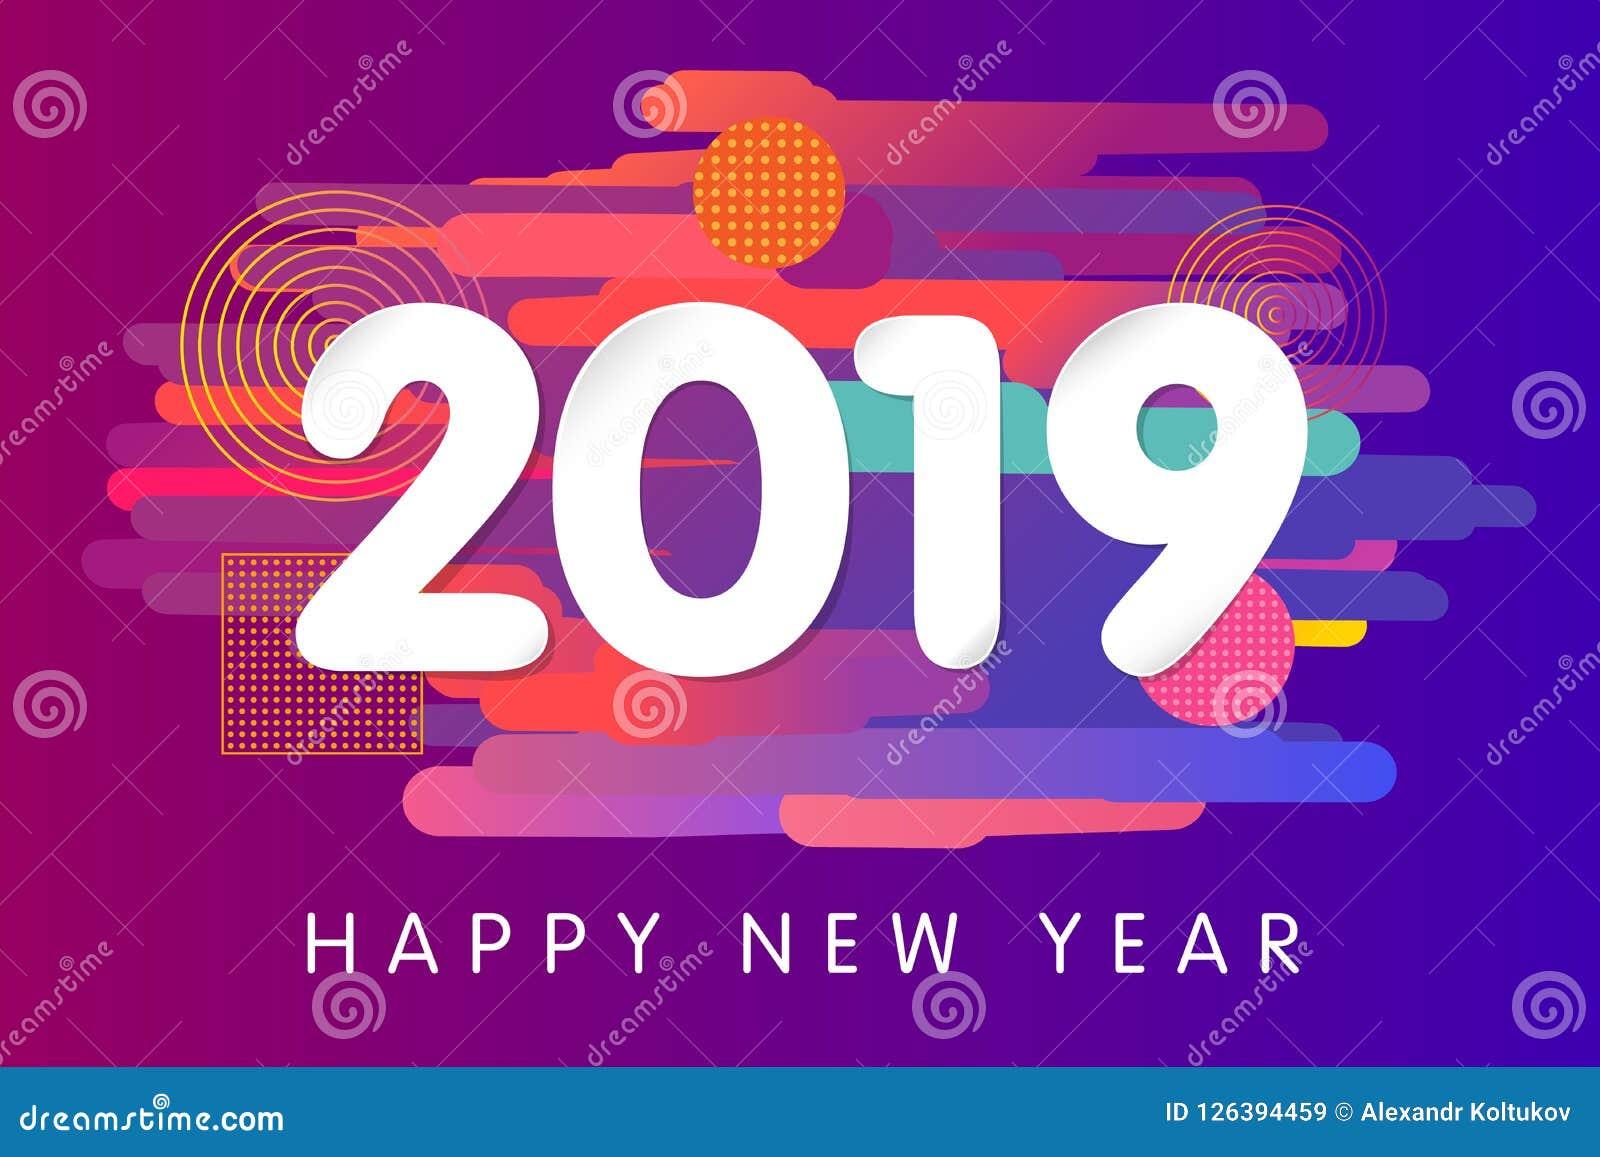 2019 Happy New Year Card Design Stock Vector ...